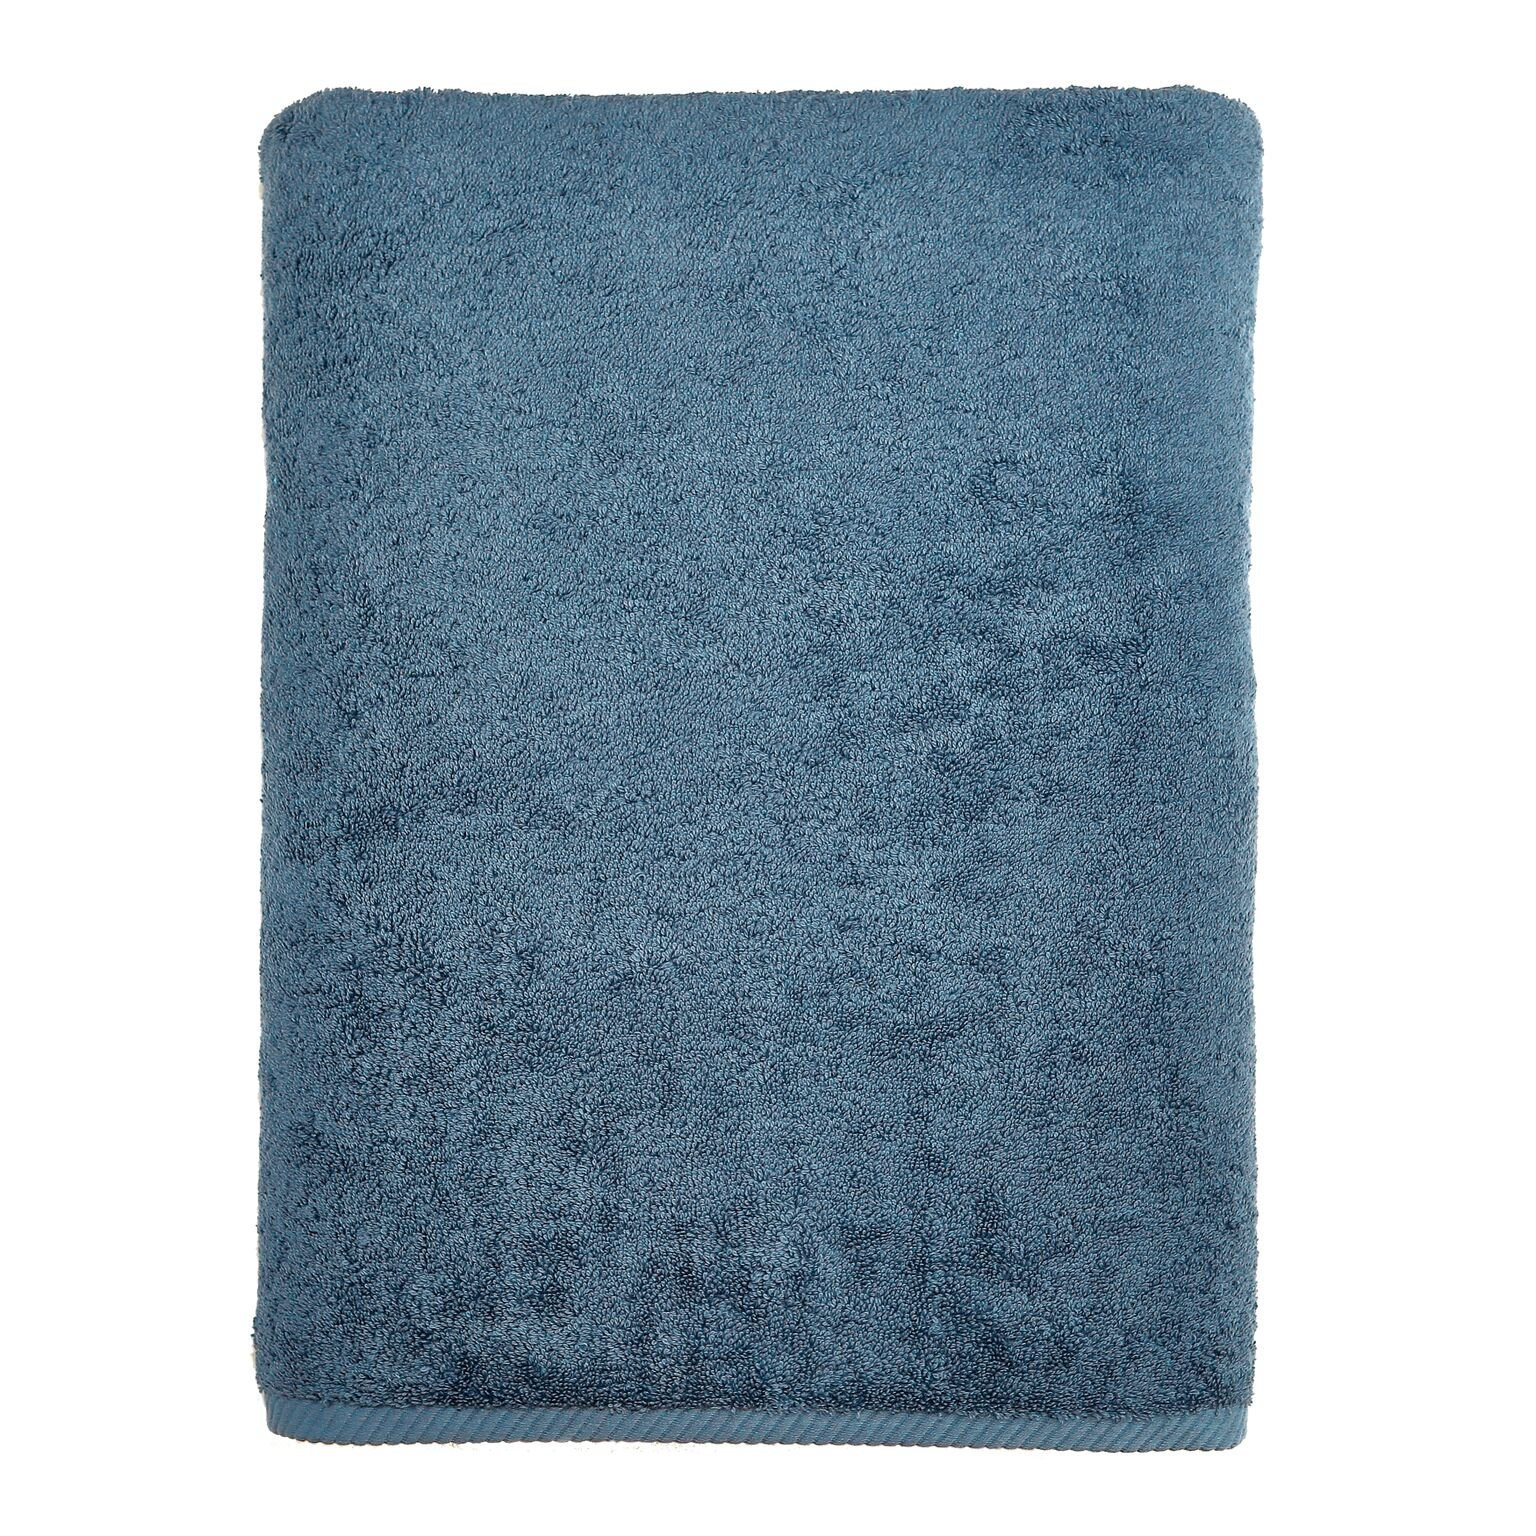 Linum Home Textiles Soft Twist Premium Authentic Soft 100% Turkish Cotton Luxury Hotel Collection Bath Sheet, Midnight Blue